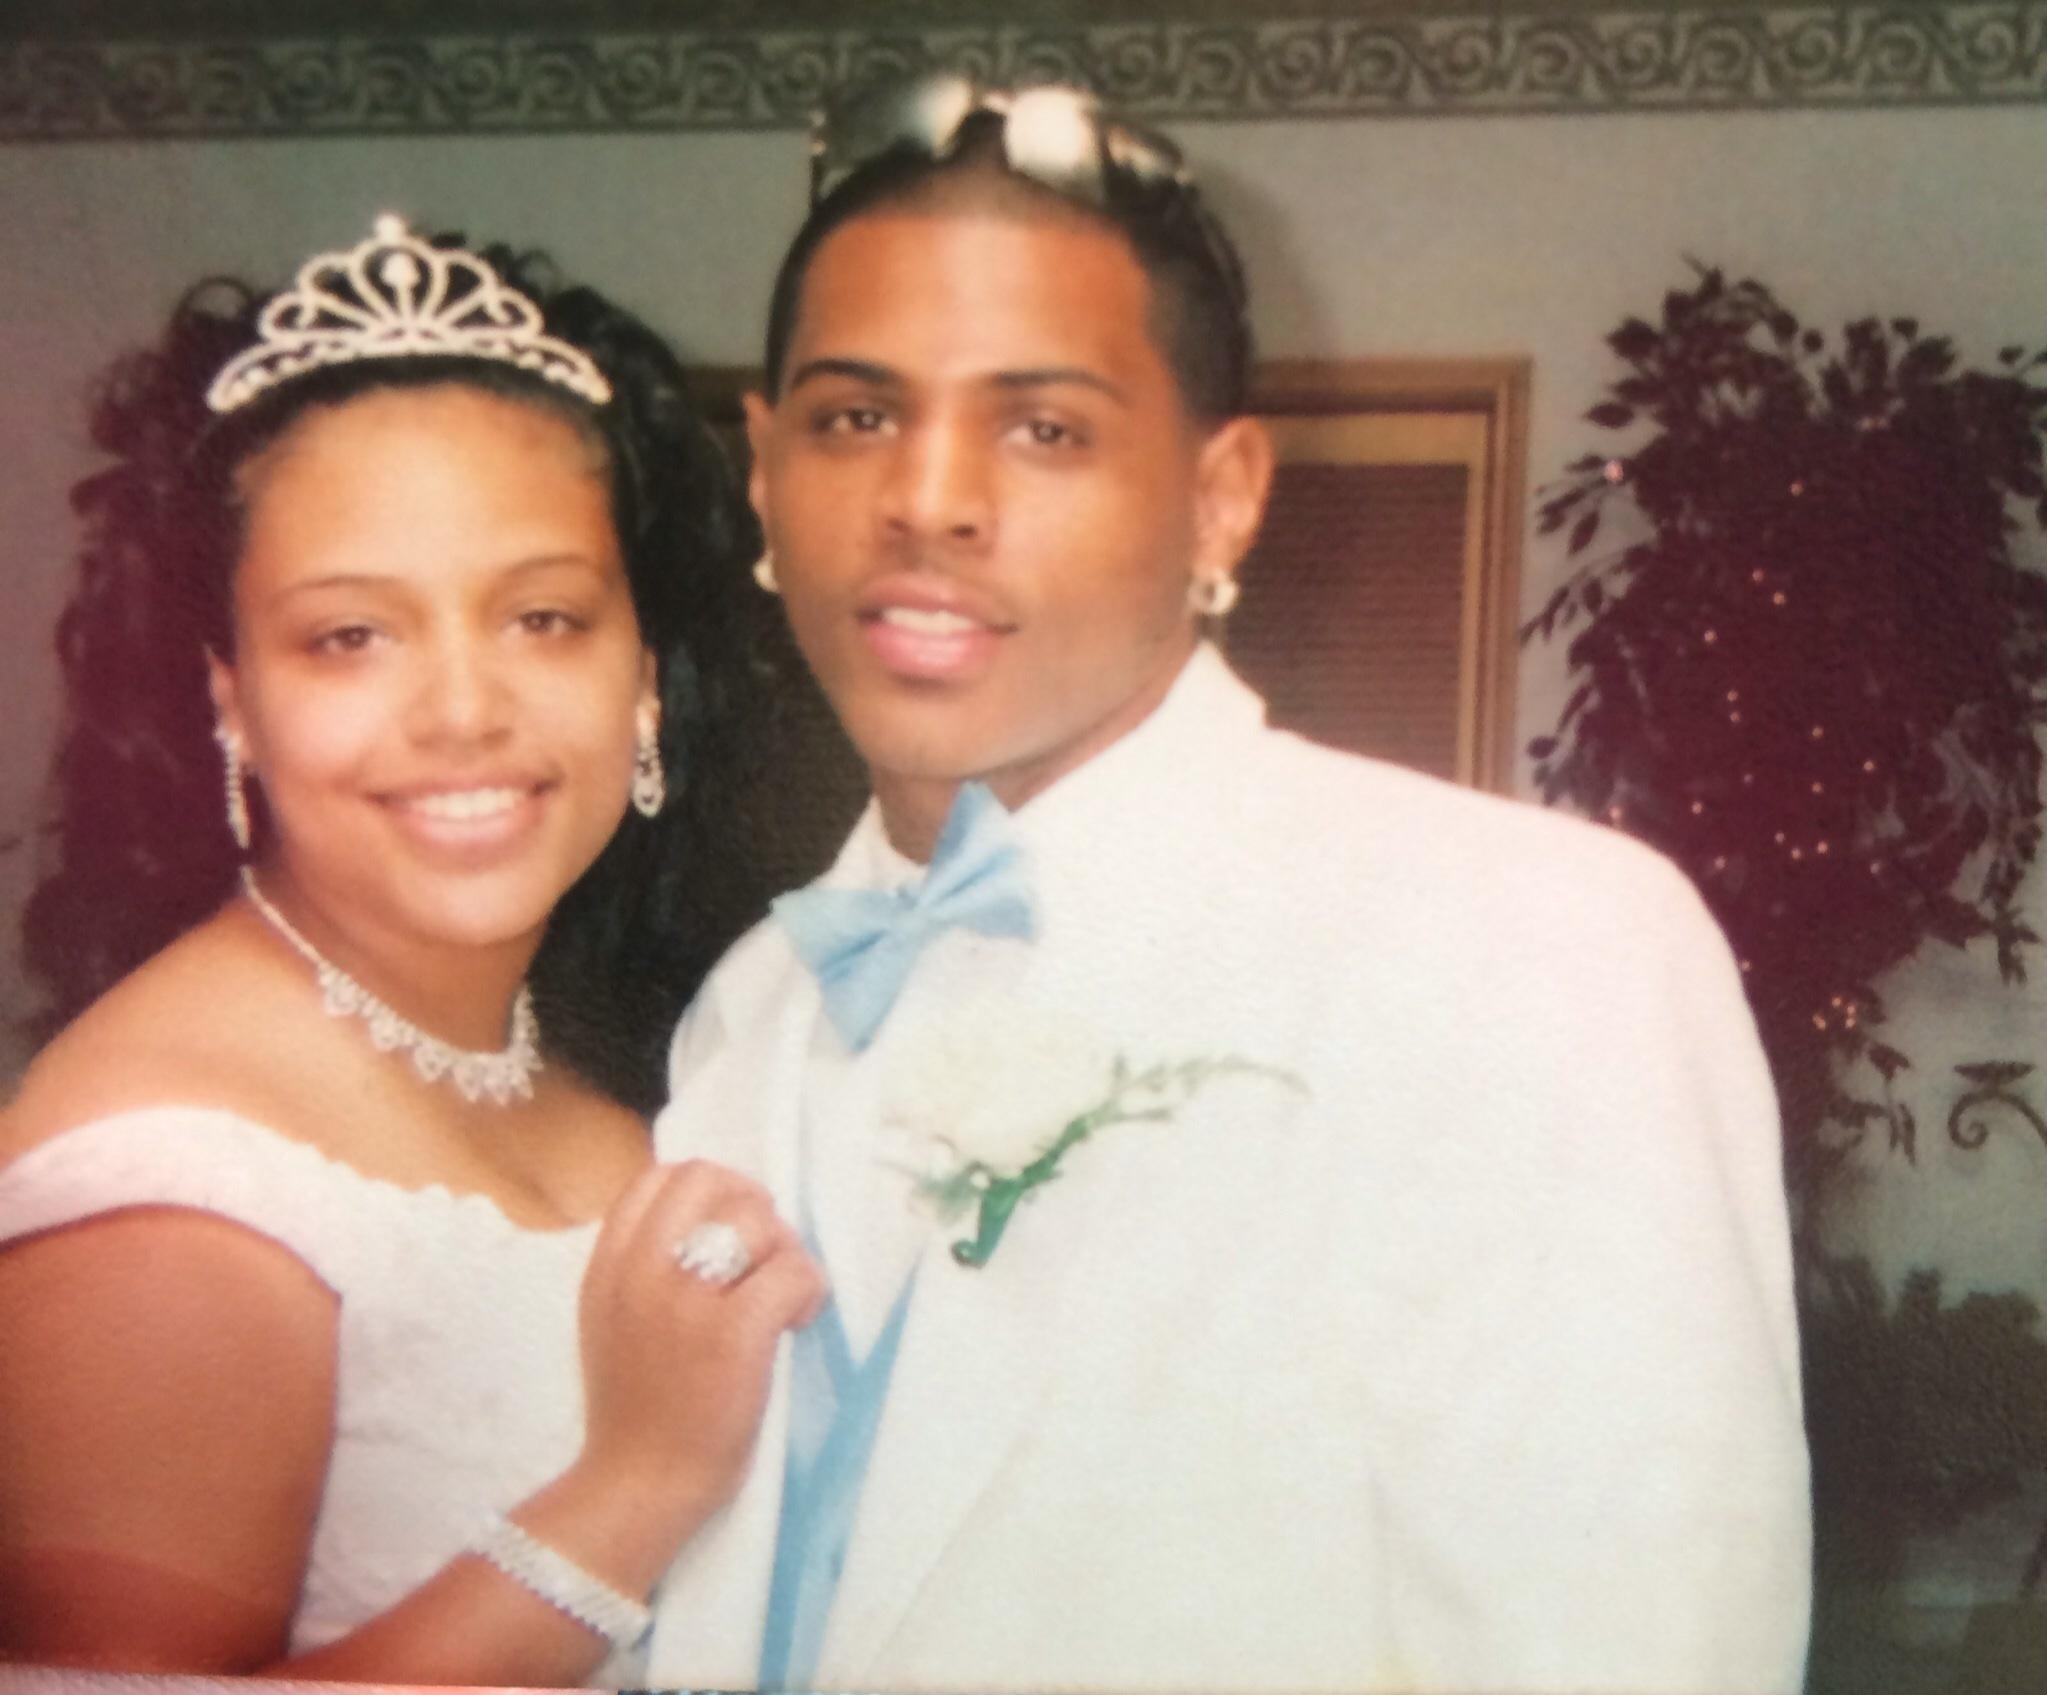 evan and danielle wedding wedding website wedding on